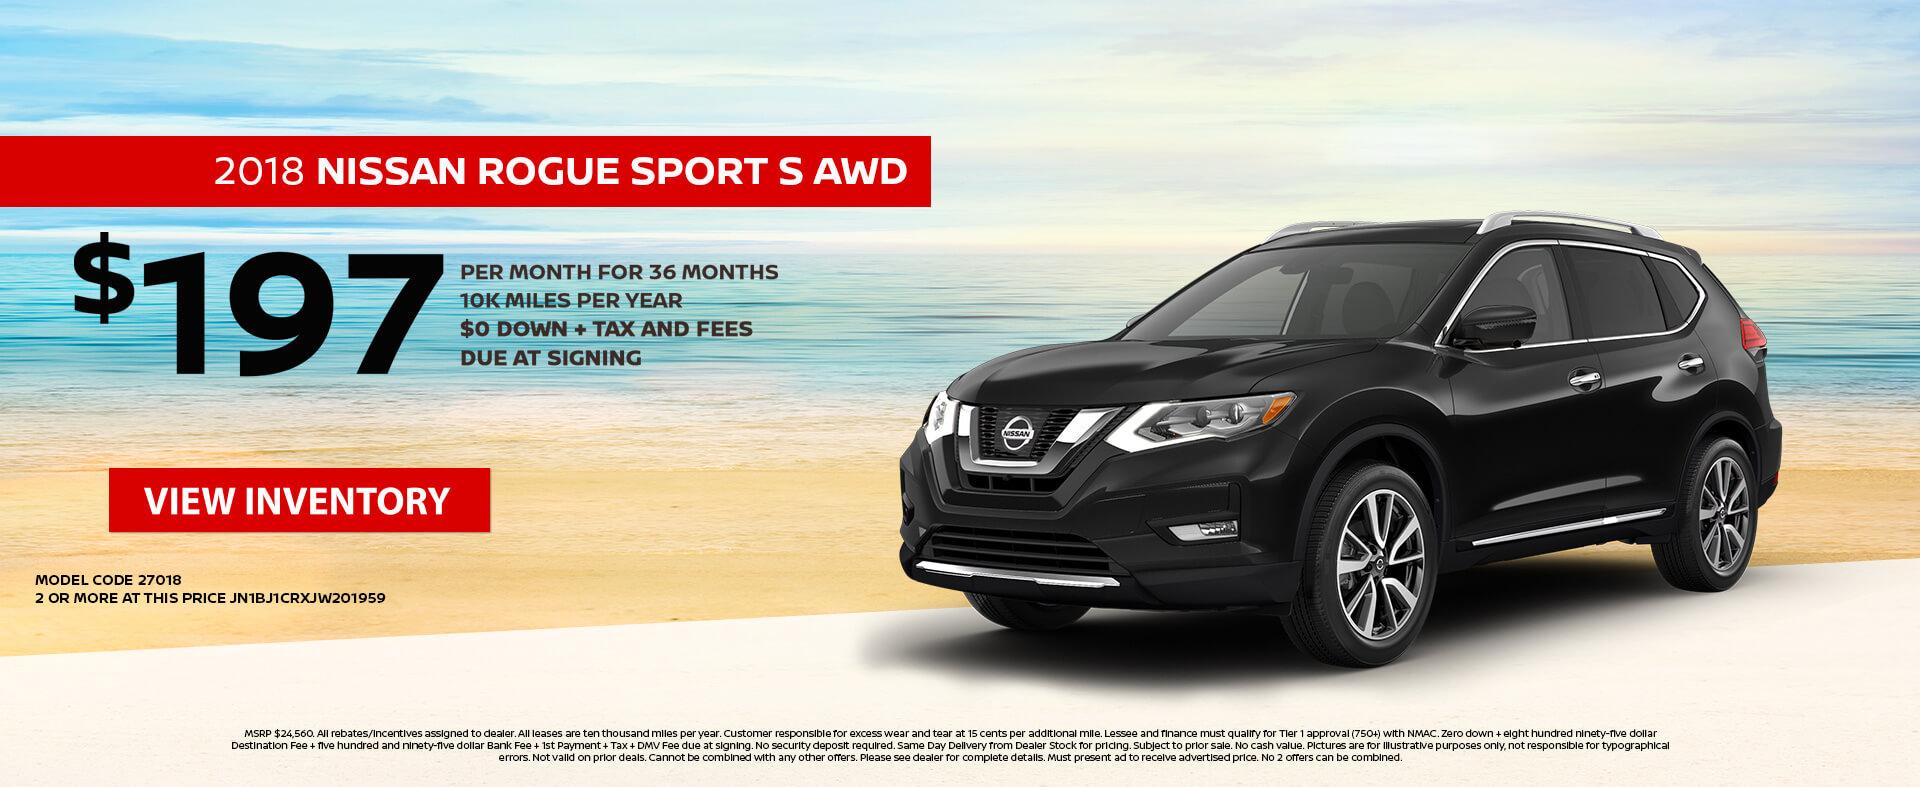 Nissan Rogue Sport $197 Lease